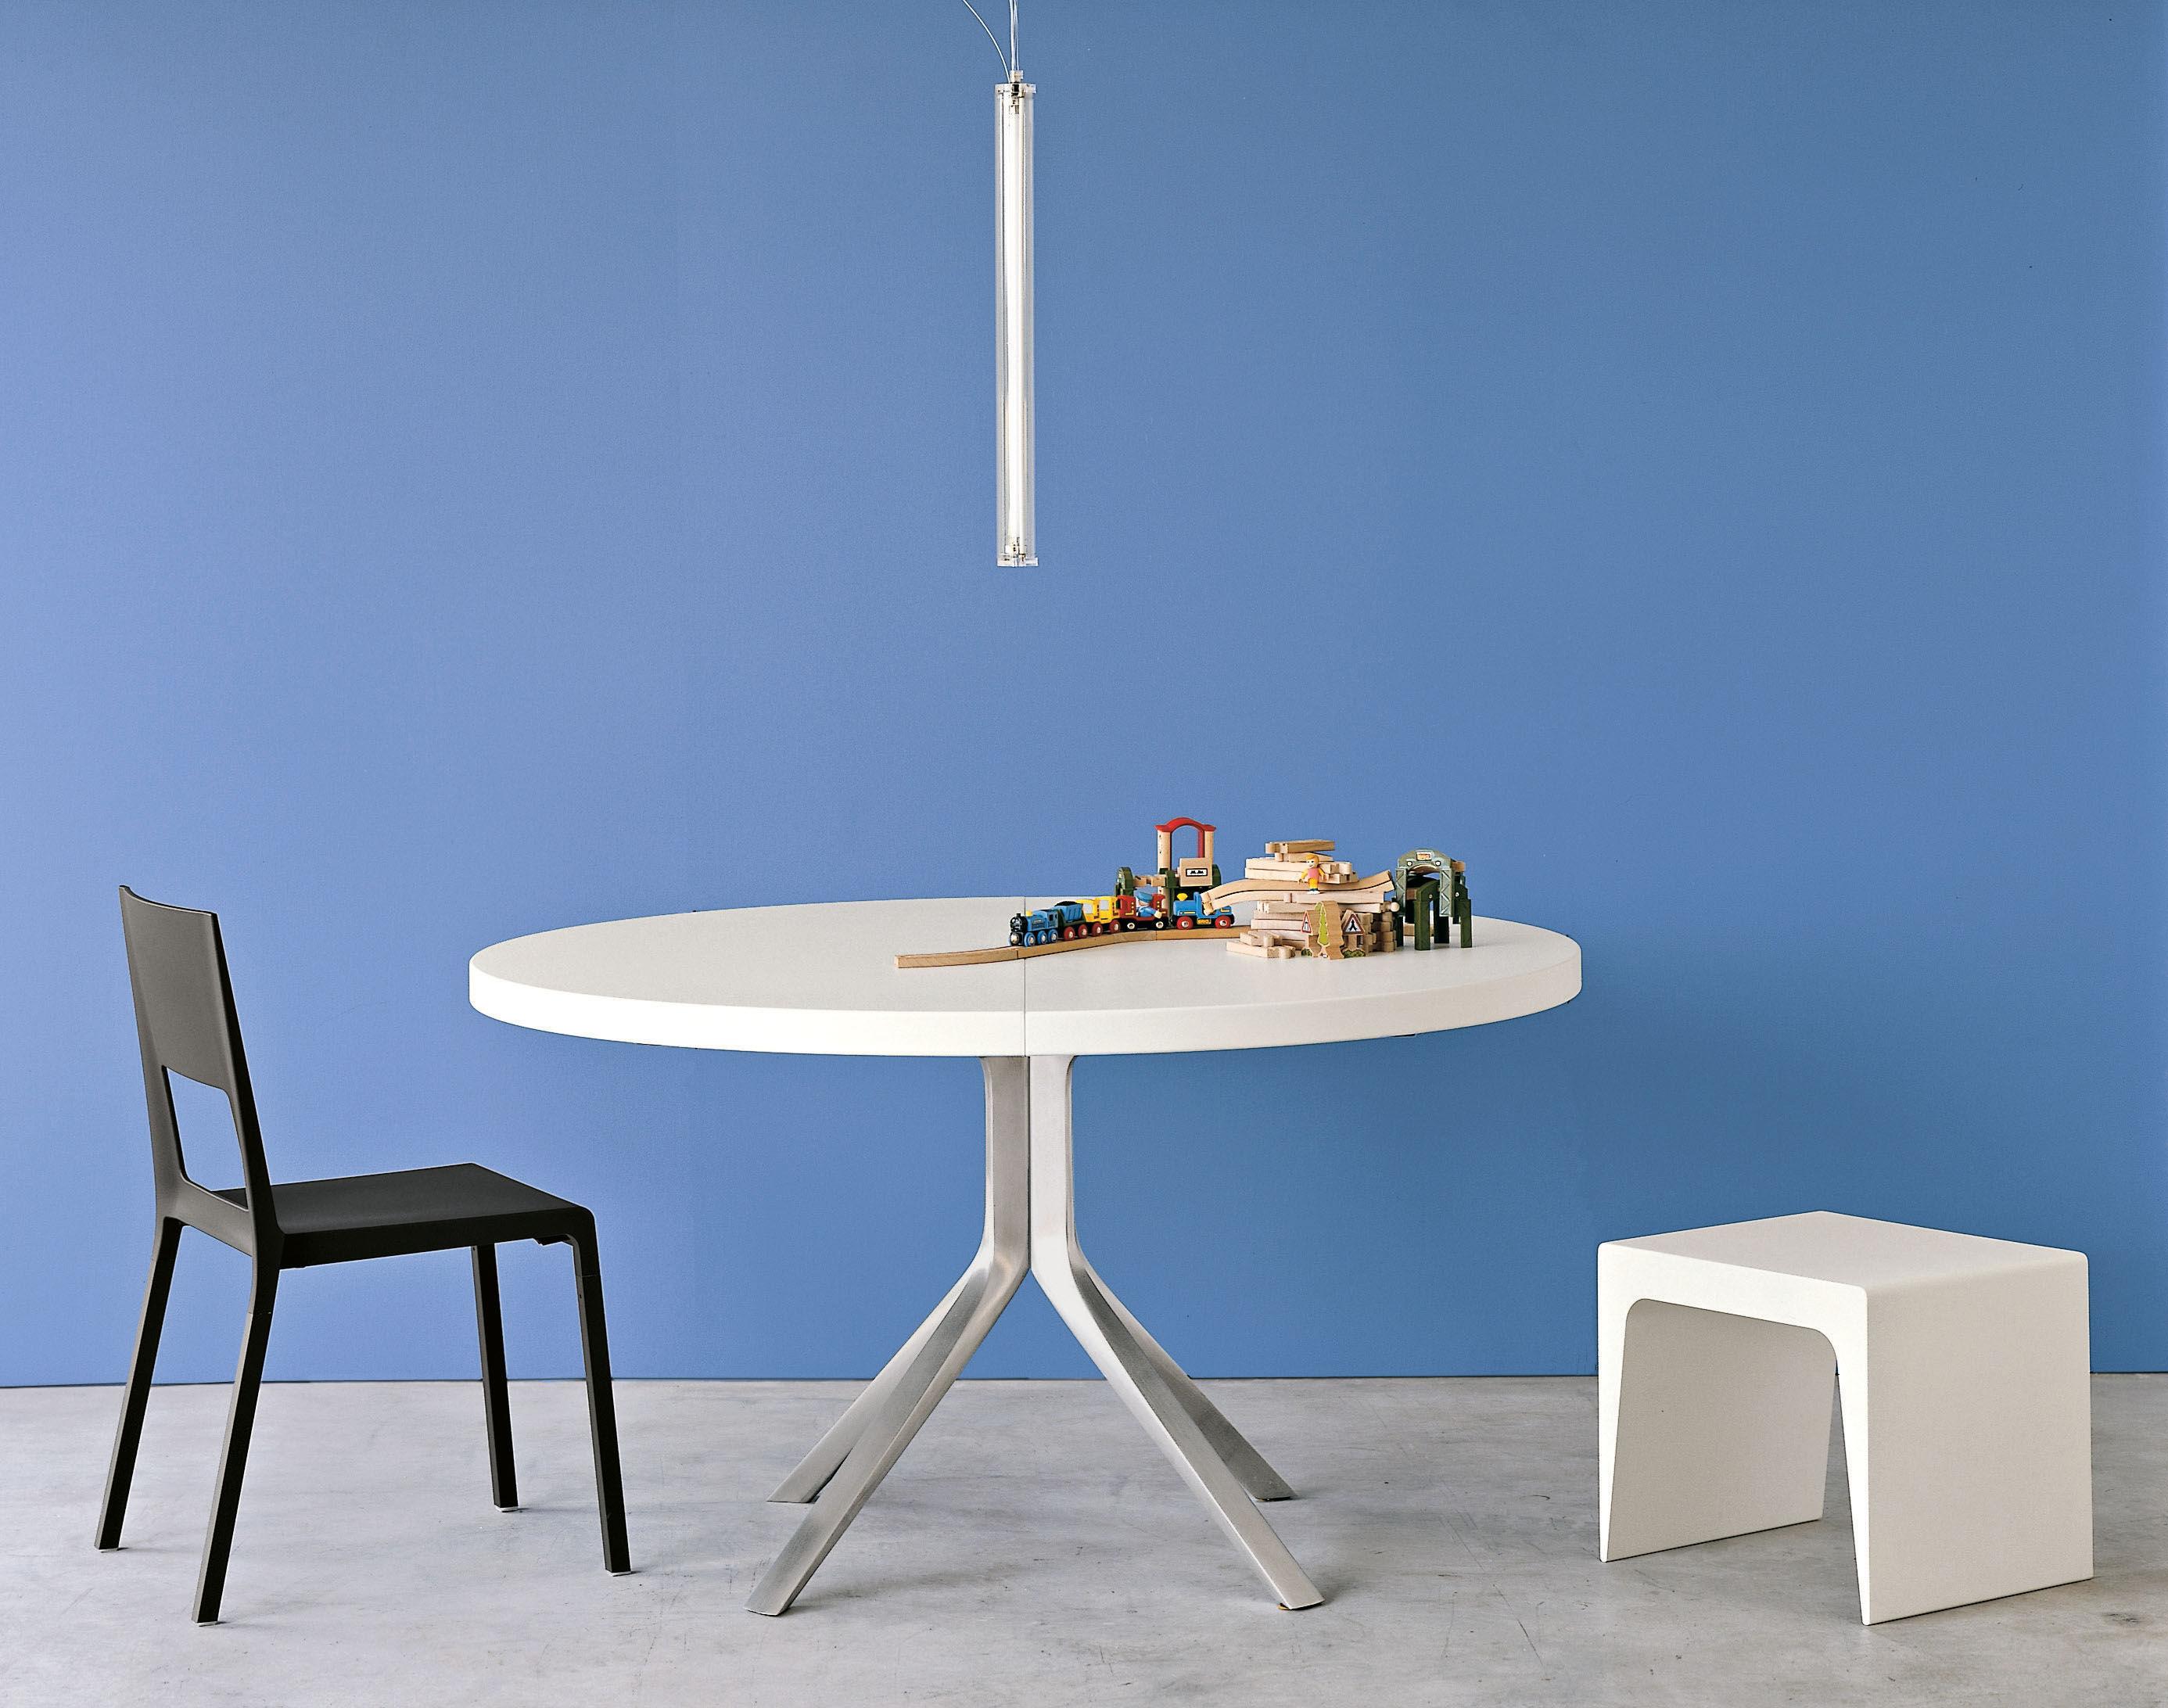 Tavolo con prolunga oops di kristalia bianco made in for Prolunga tavolo